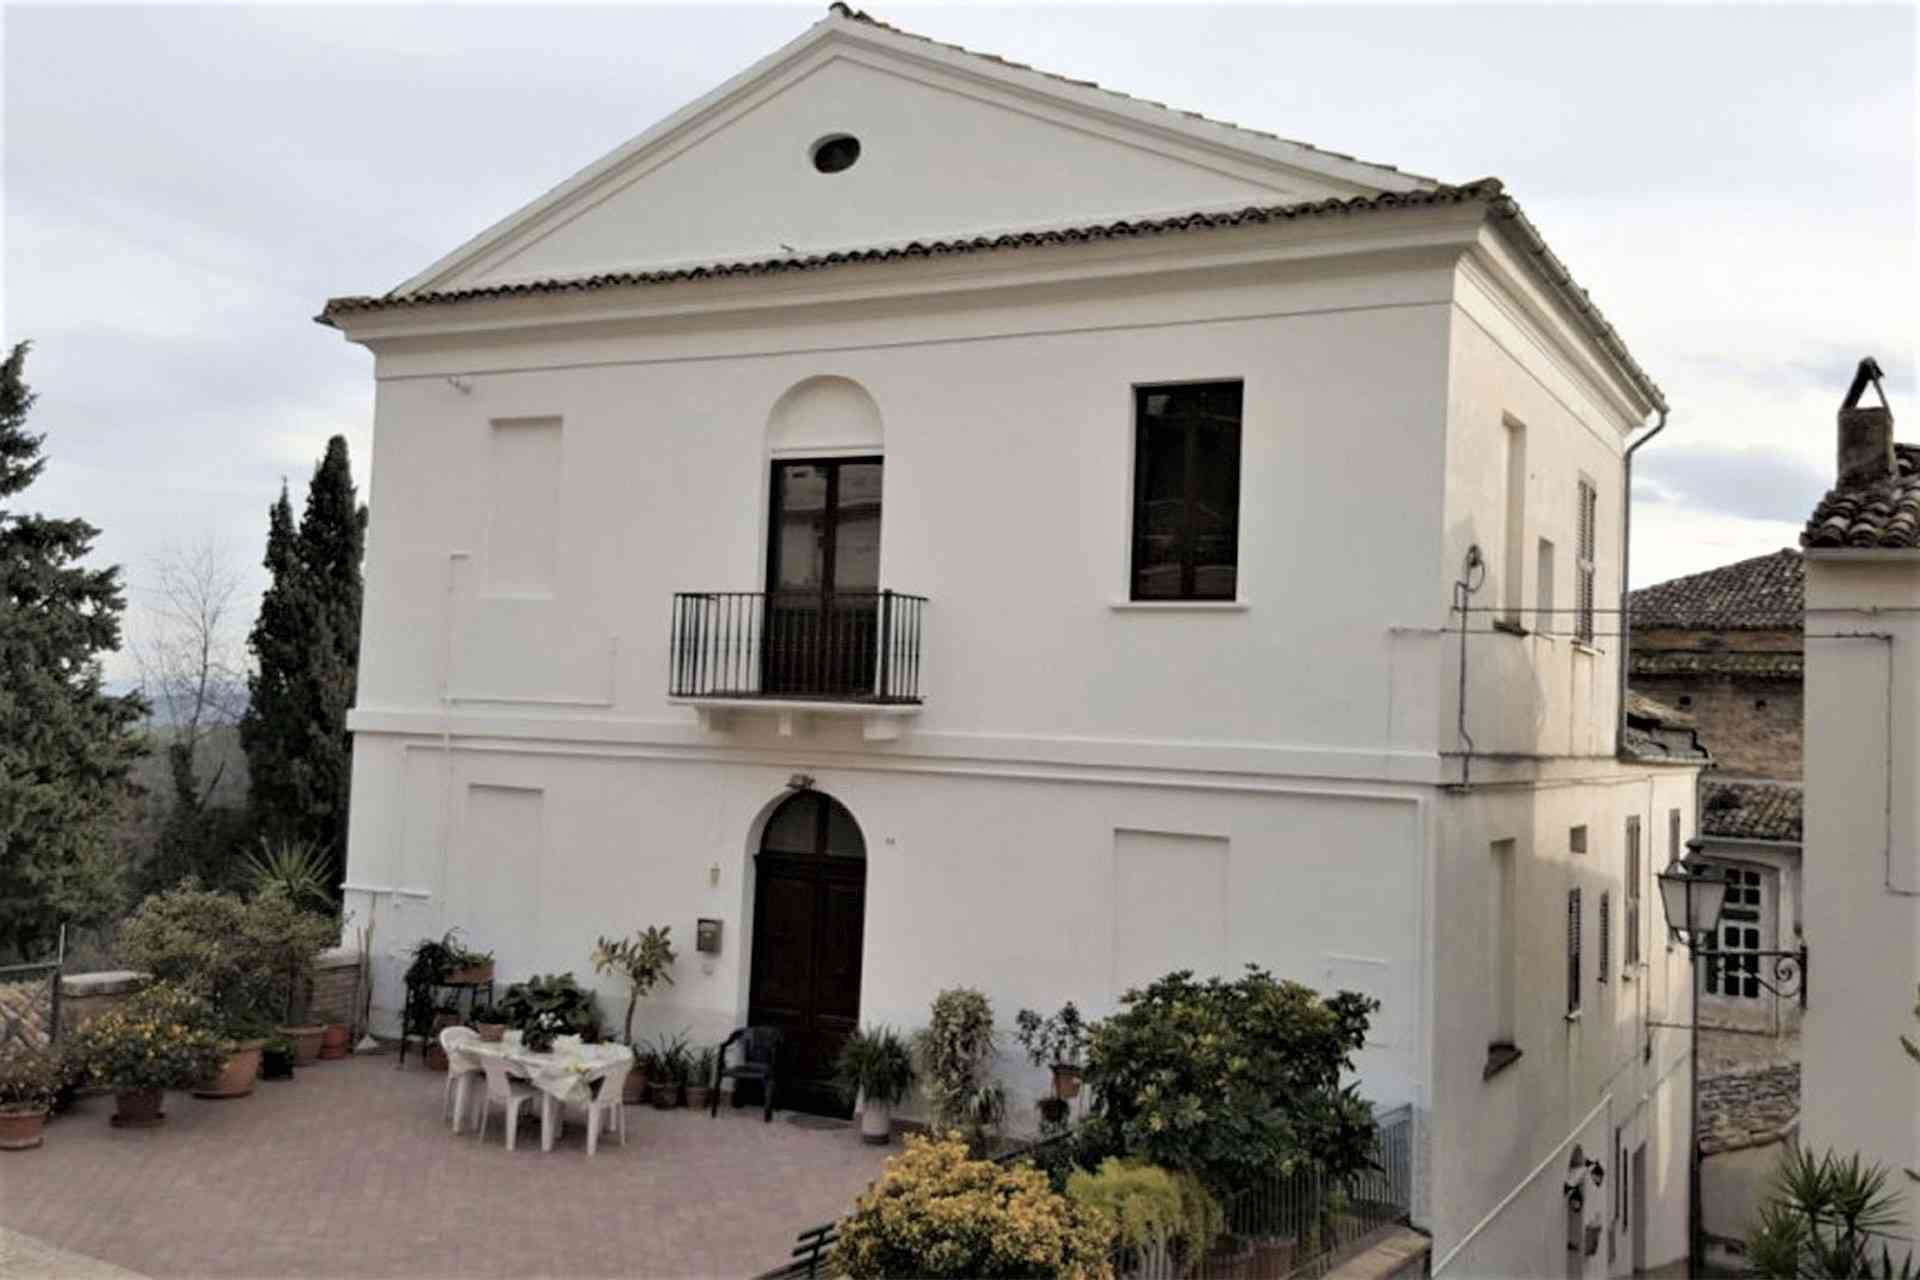 Casa in paese Casa Diamante - Loreto Aprutino - EUR 279.097